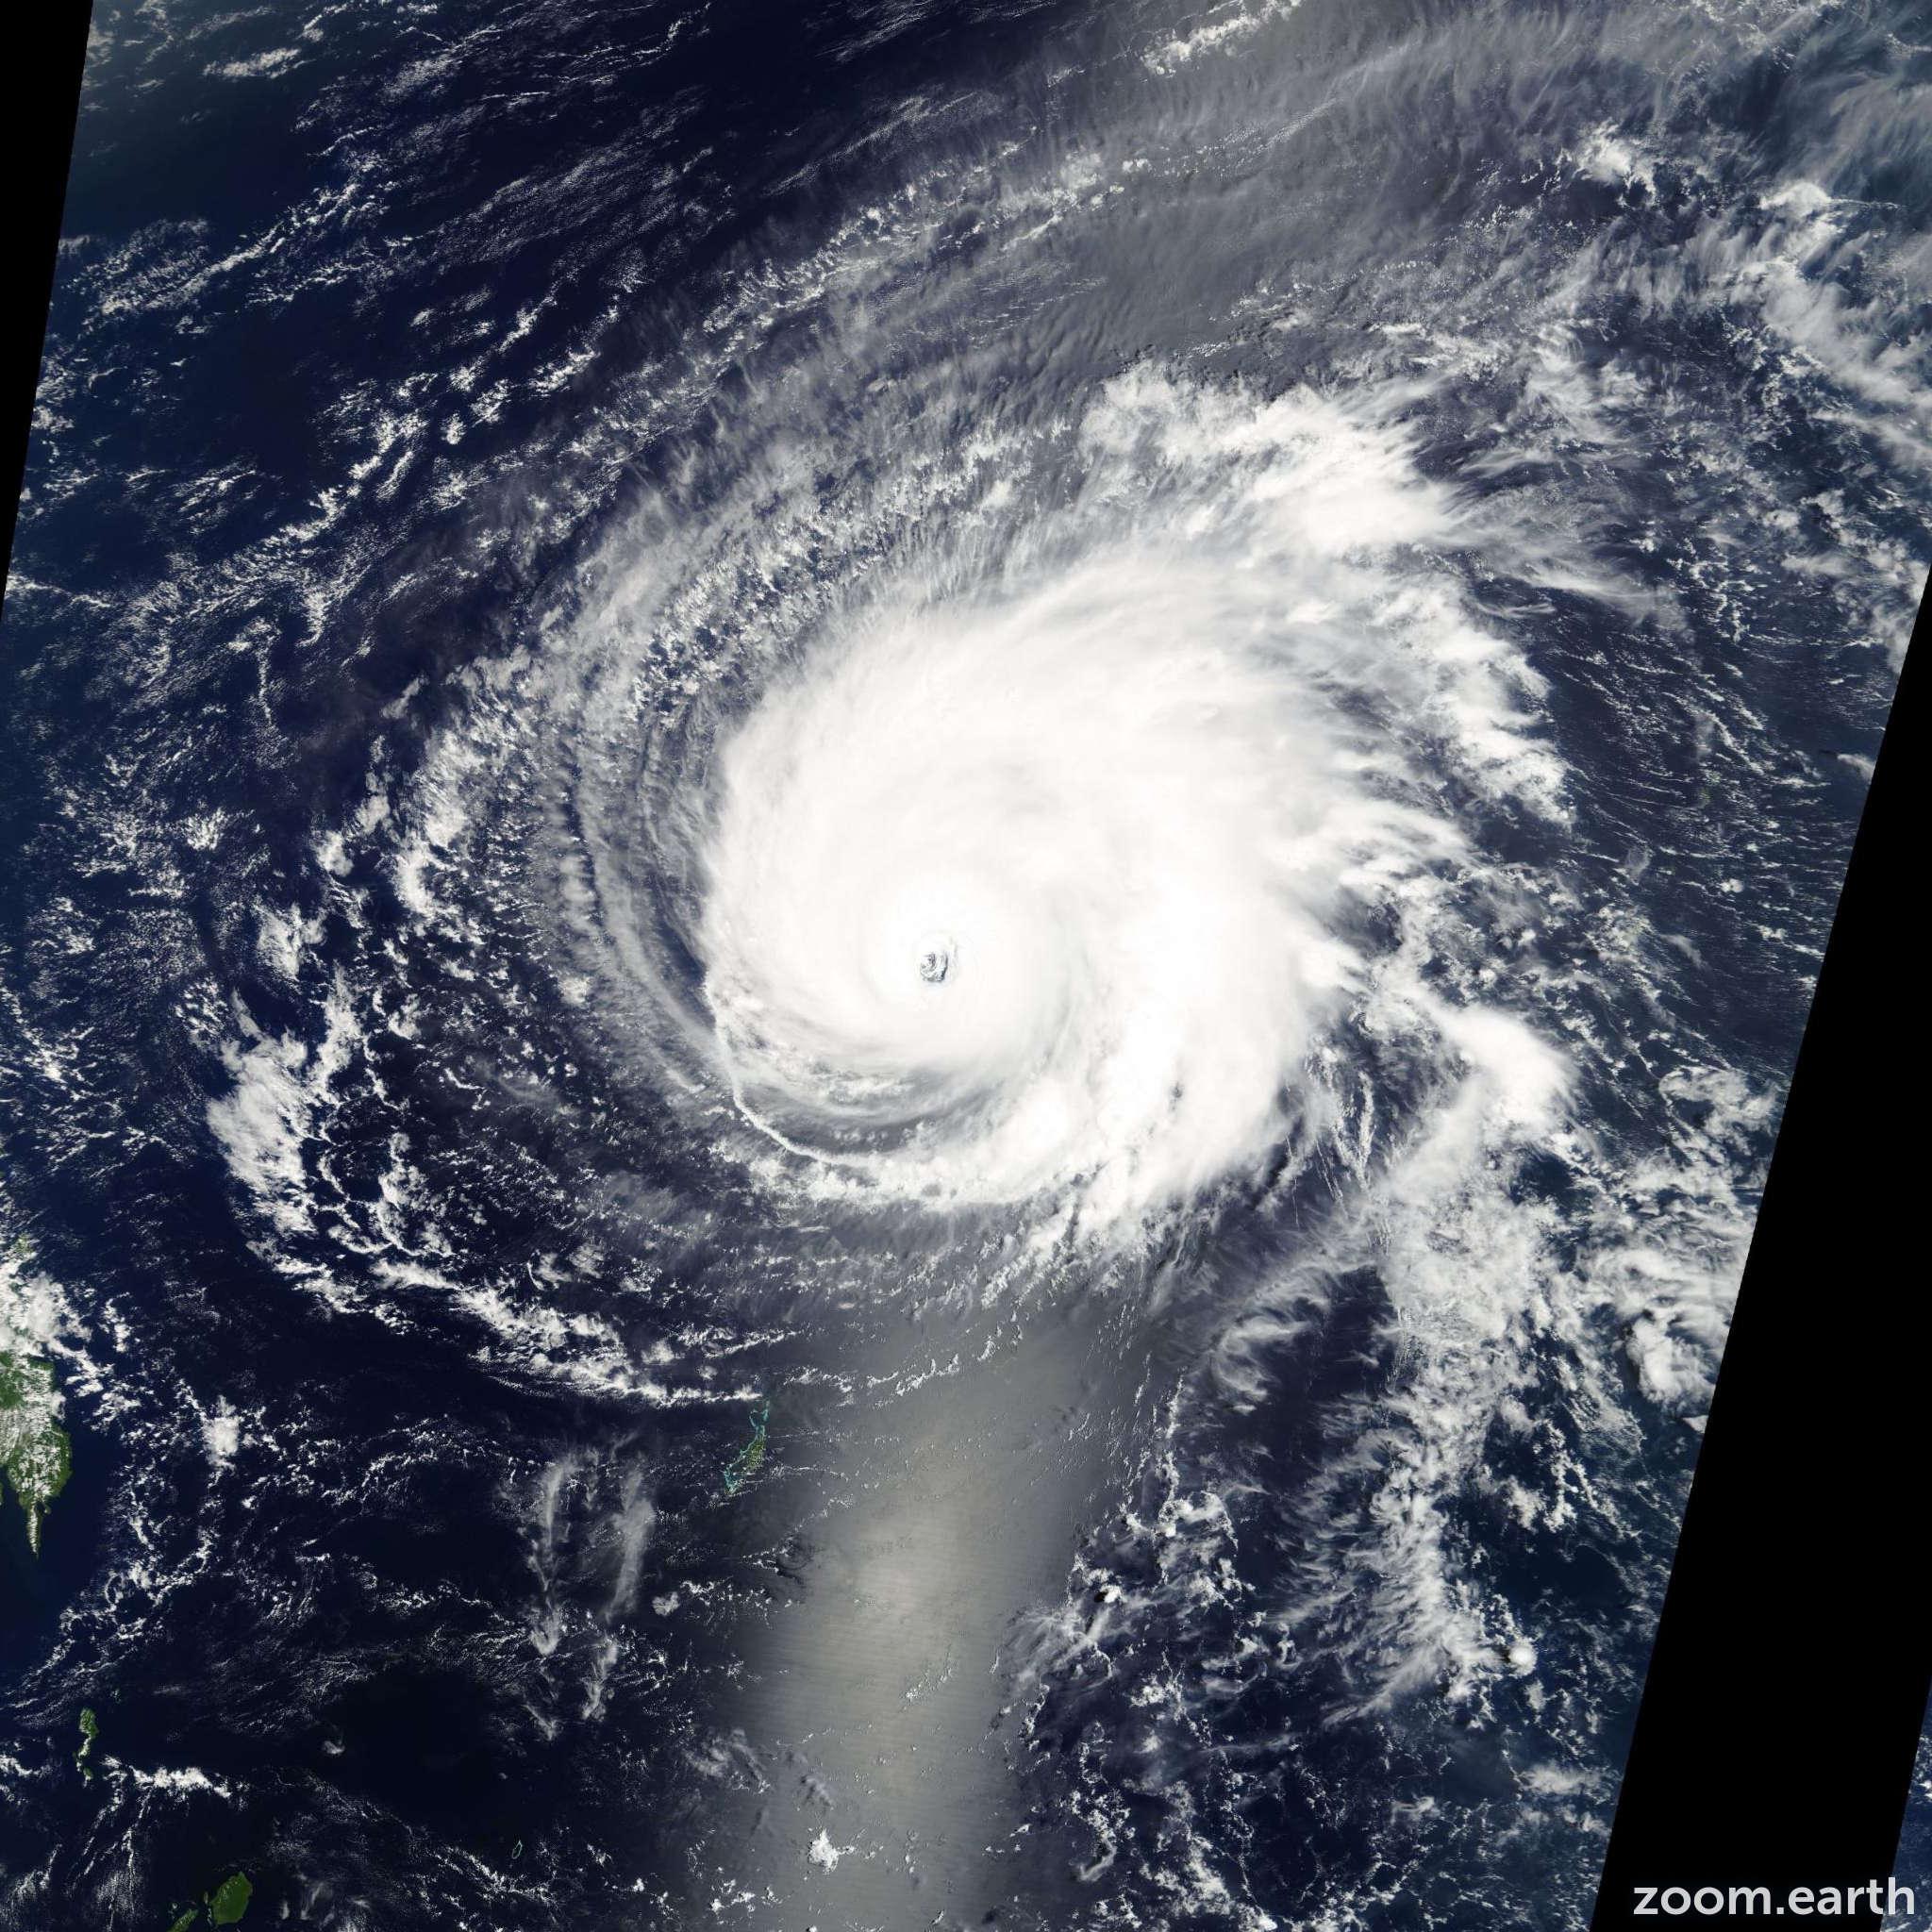 Satellite image of Typhoon Kujira 2003